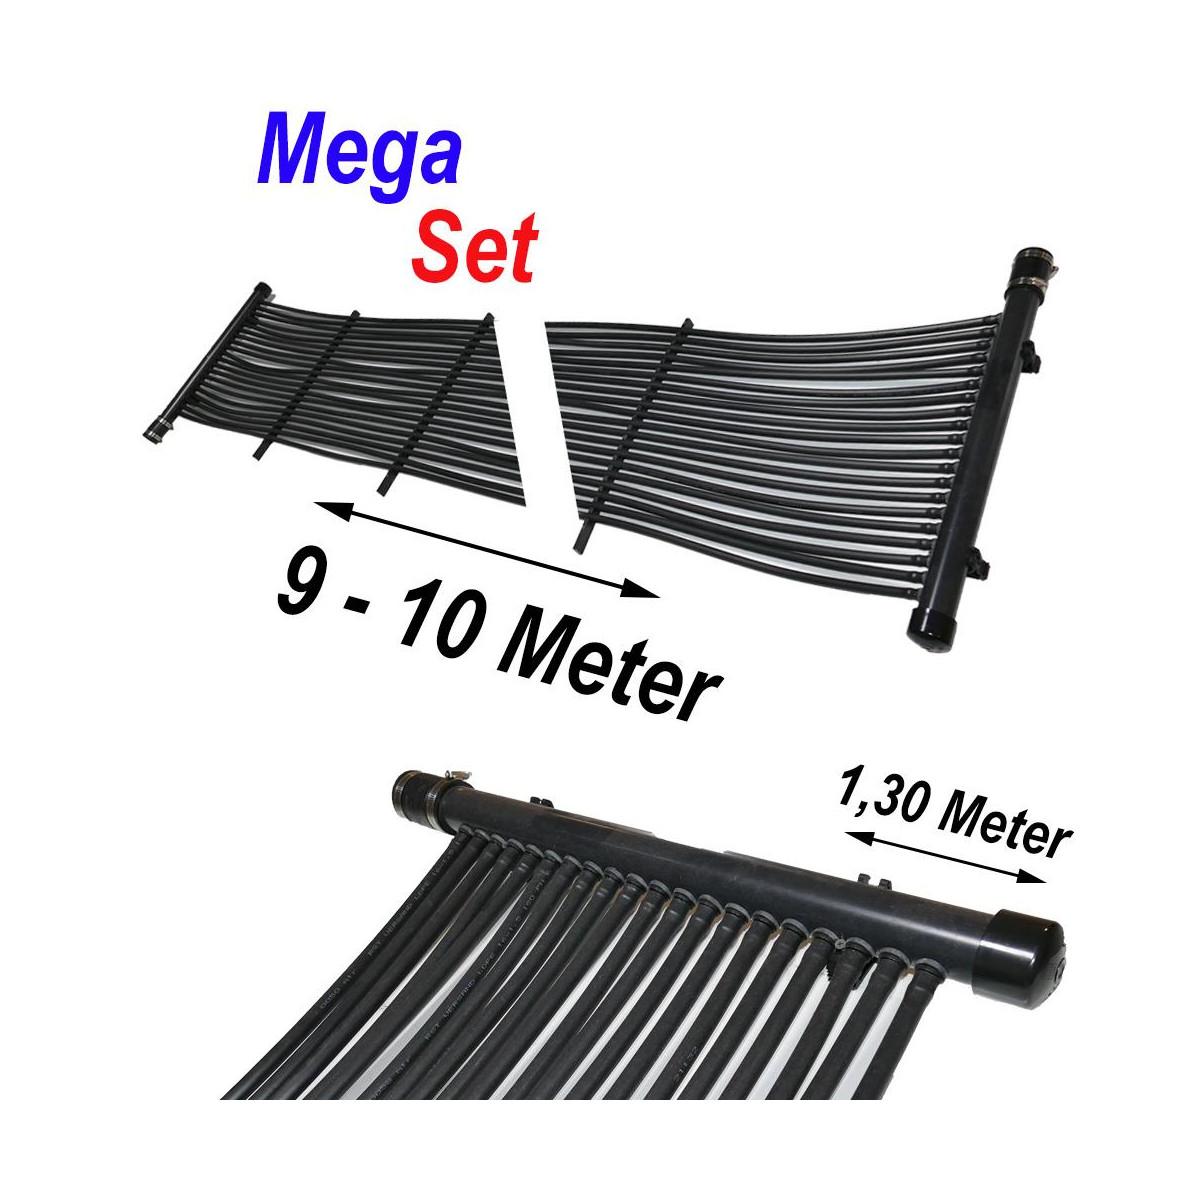 RST-VERSAND (Eigenmarke) Poolheizung Solarmatte MegaSet 12,00 m² (400 Meter)